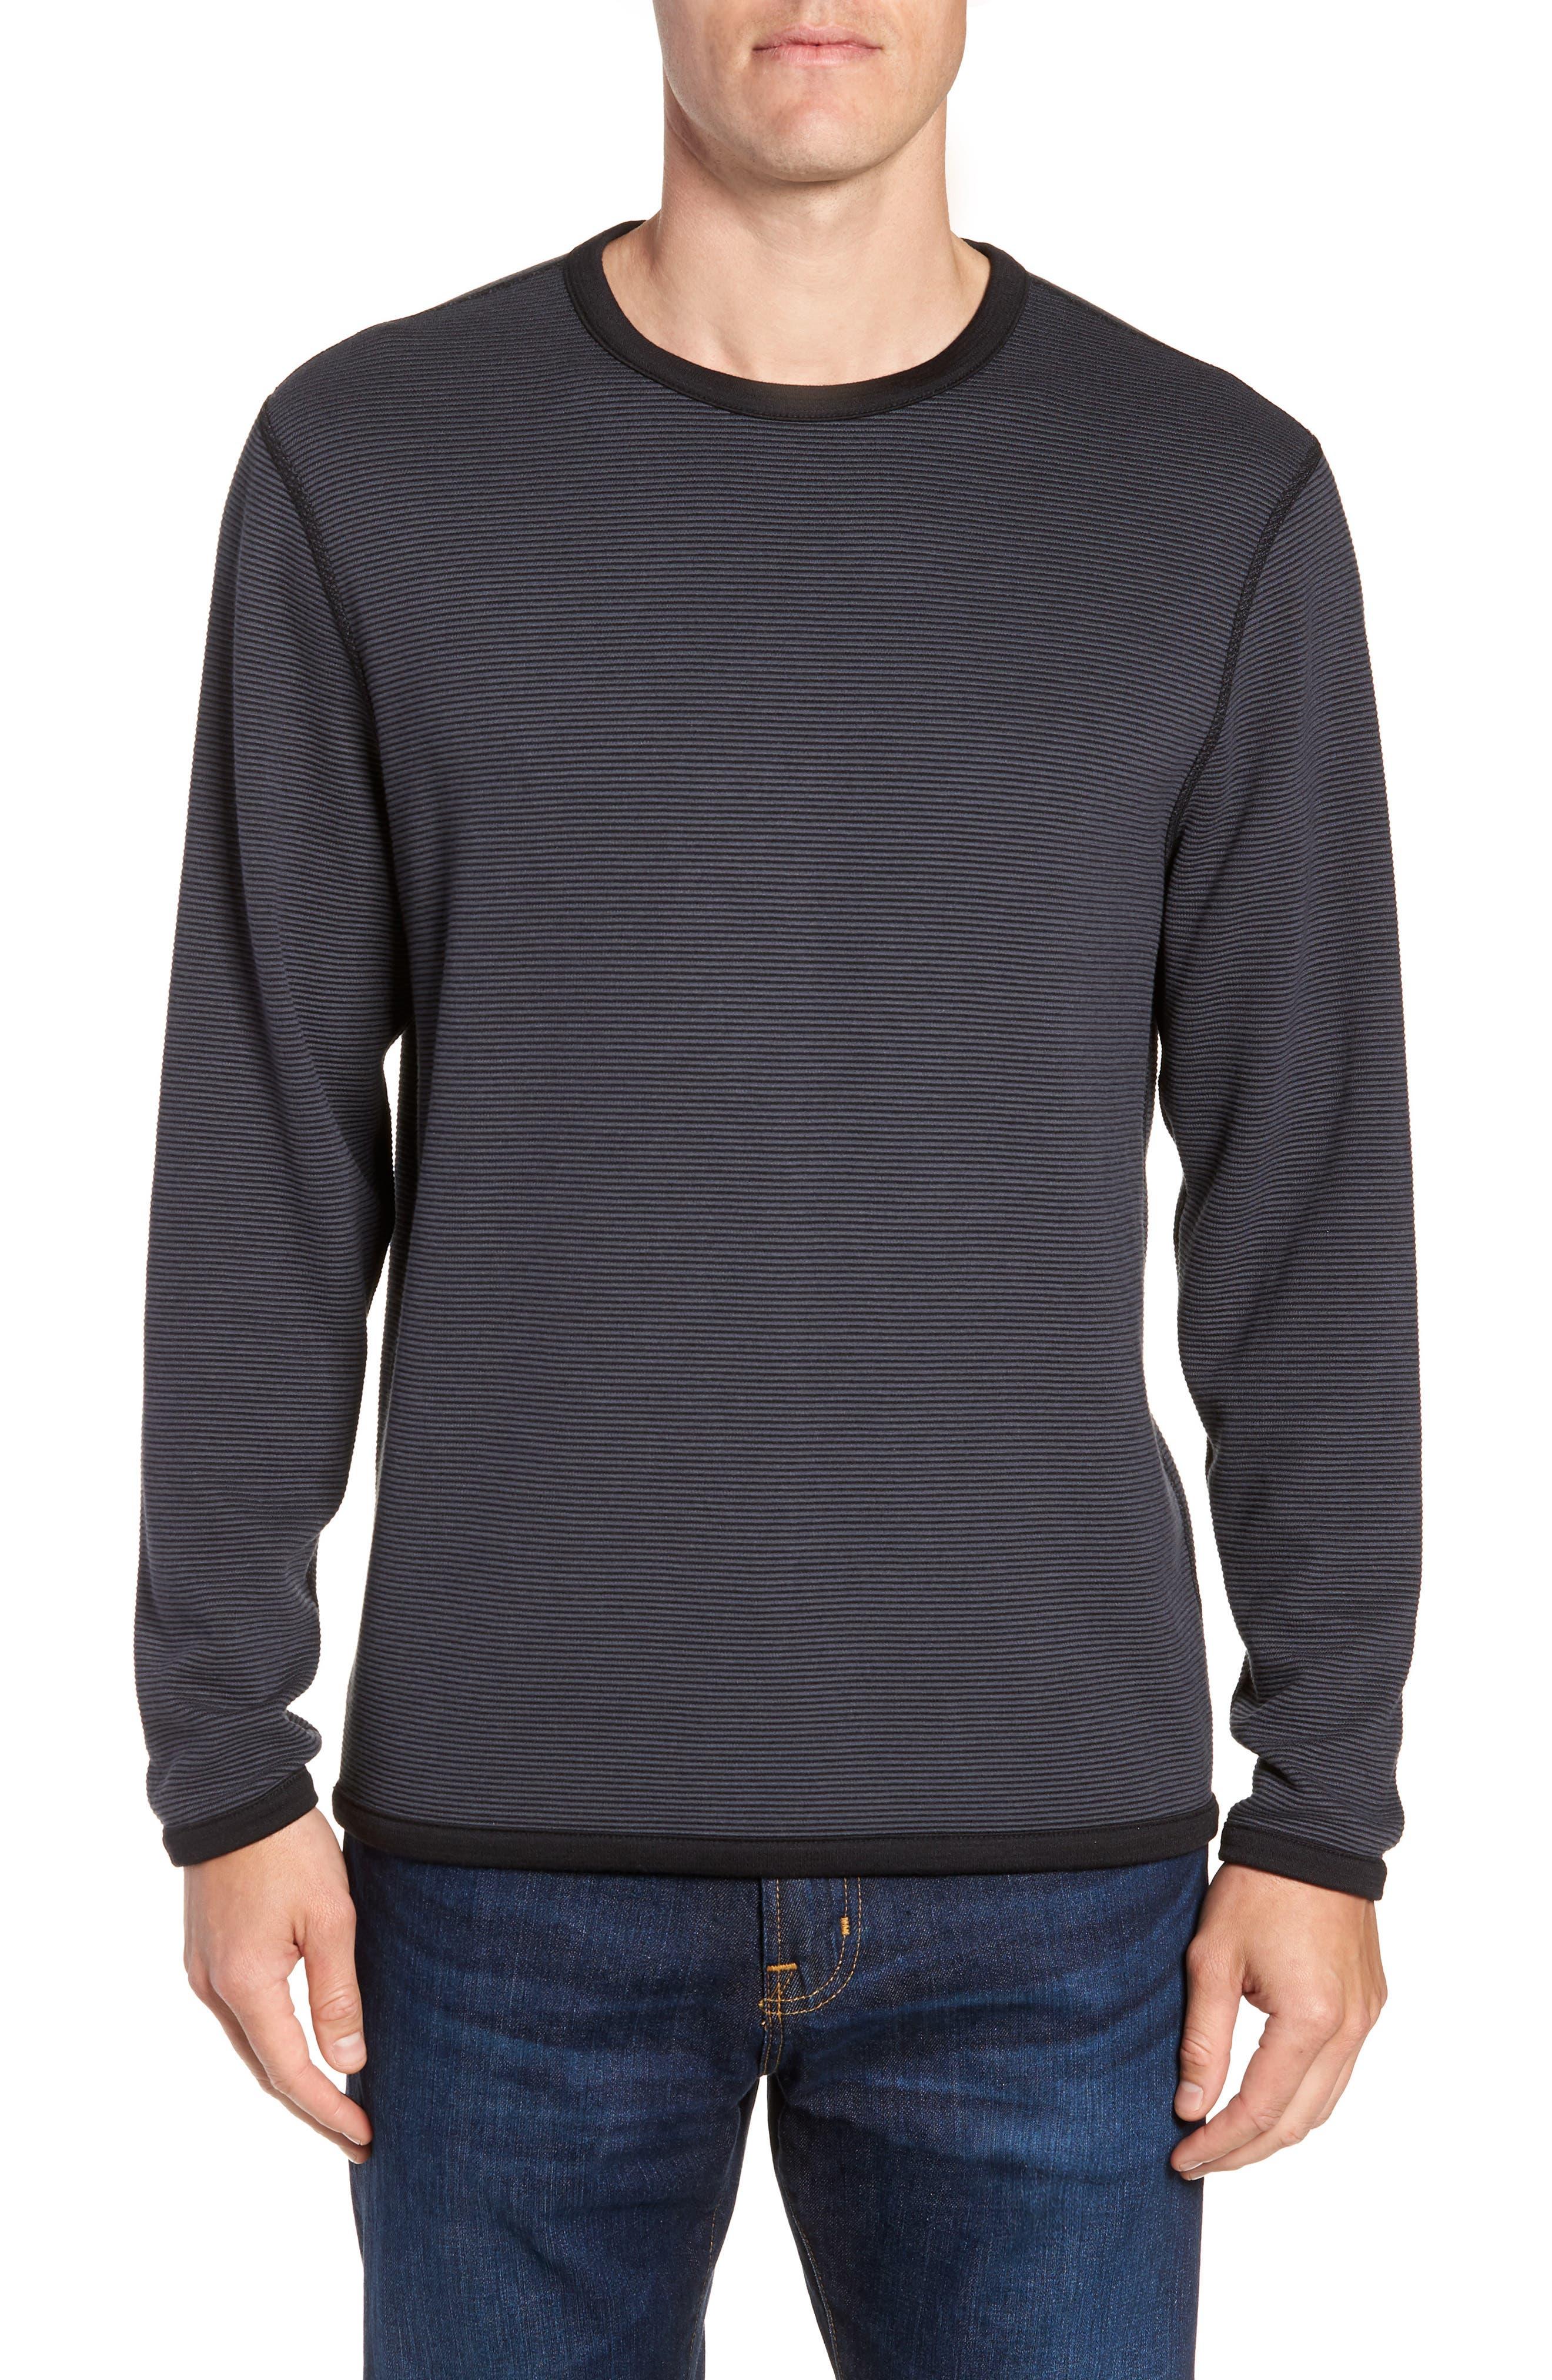 Crewneck Sweater,                             Alternate thumbnail 2, color,                             BLACK CAVIAR